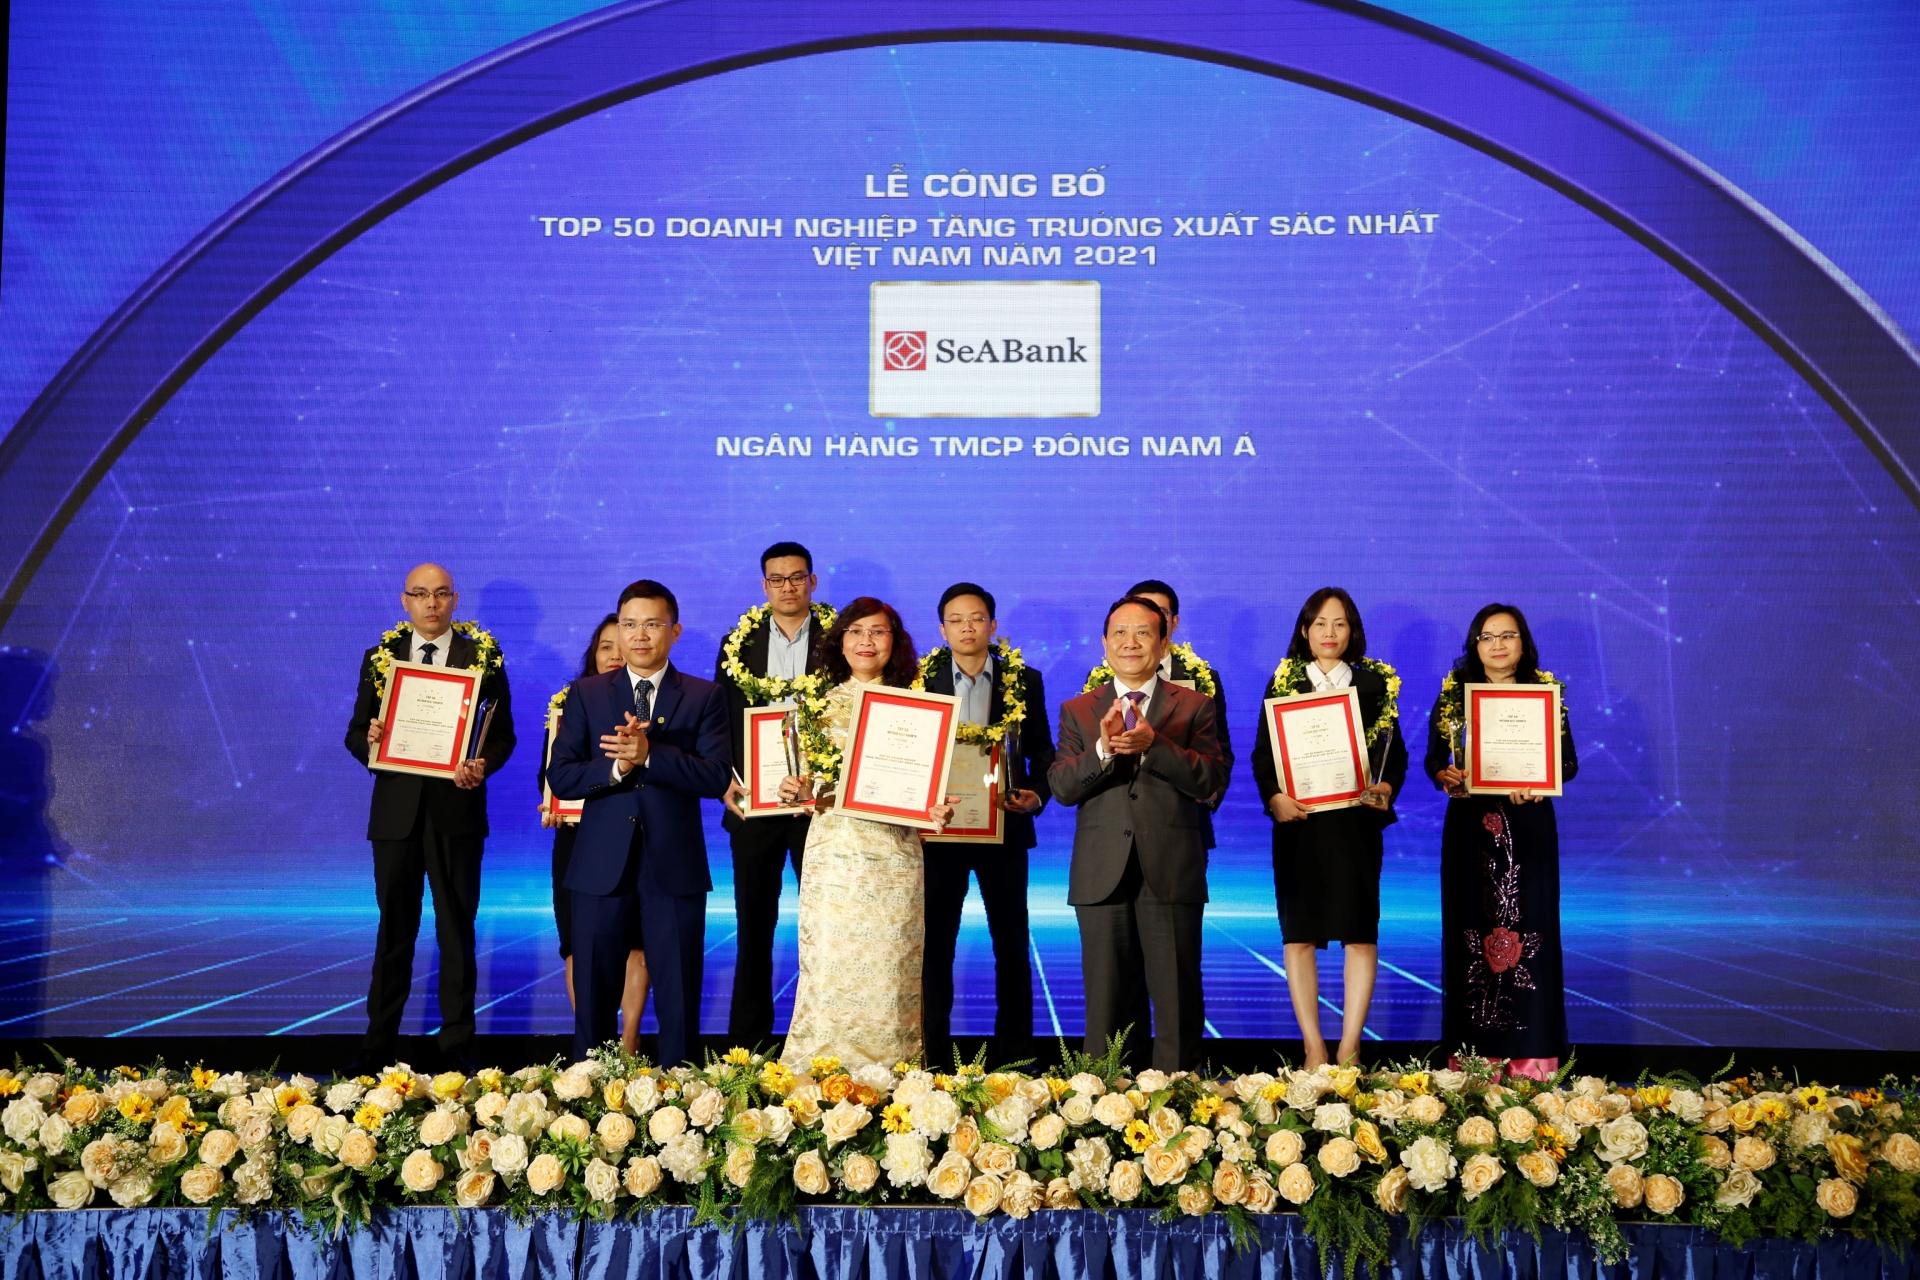 seabank duoc vinh danh trong top 50 doanh nghiep tang truong xuat sac nhat viet nam